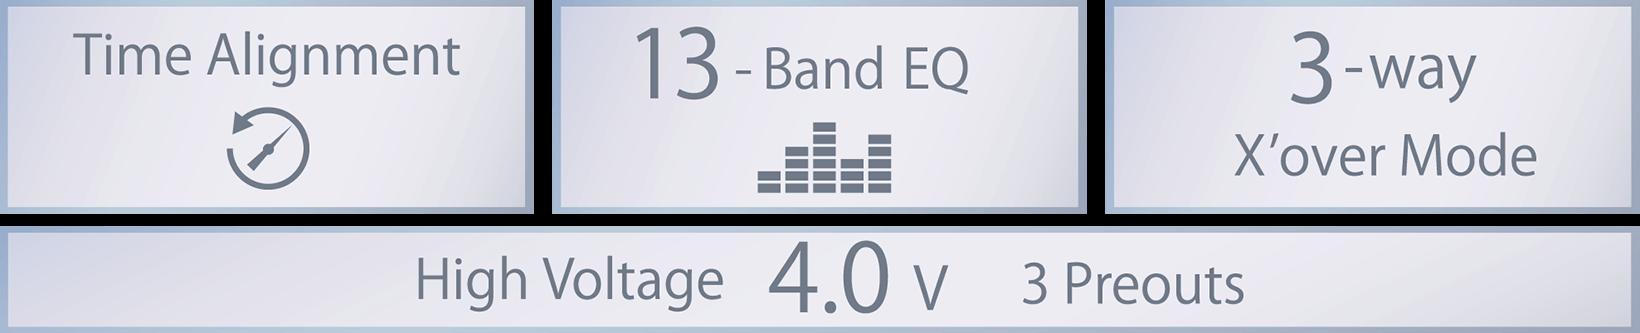 kenwood-Sound Adjustment Features